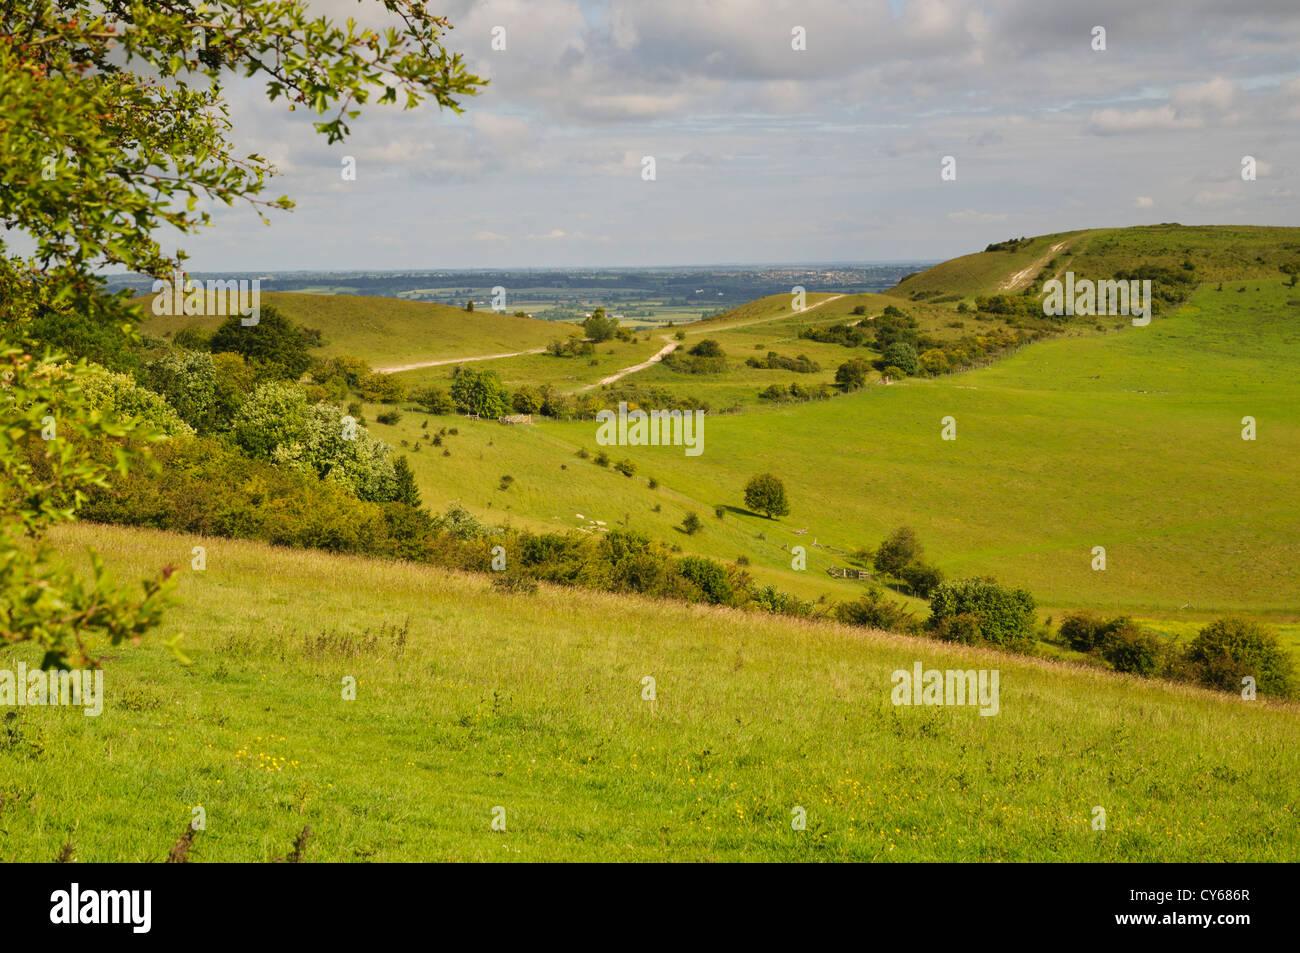 A view of Ivinghoe Beacon in Buckinghamshire. june. - Stock Image